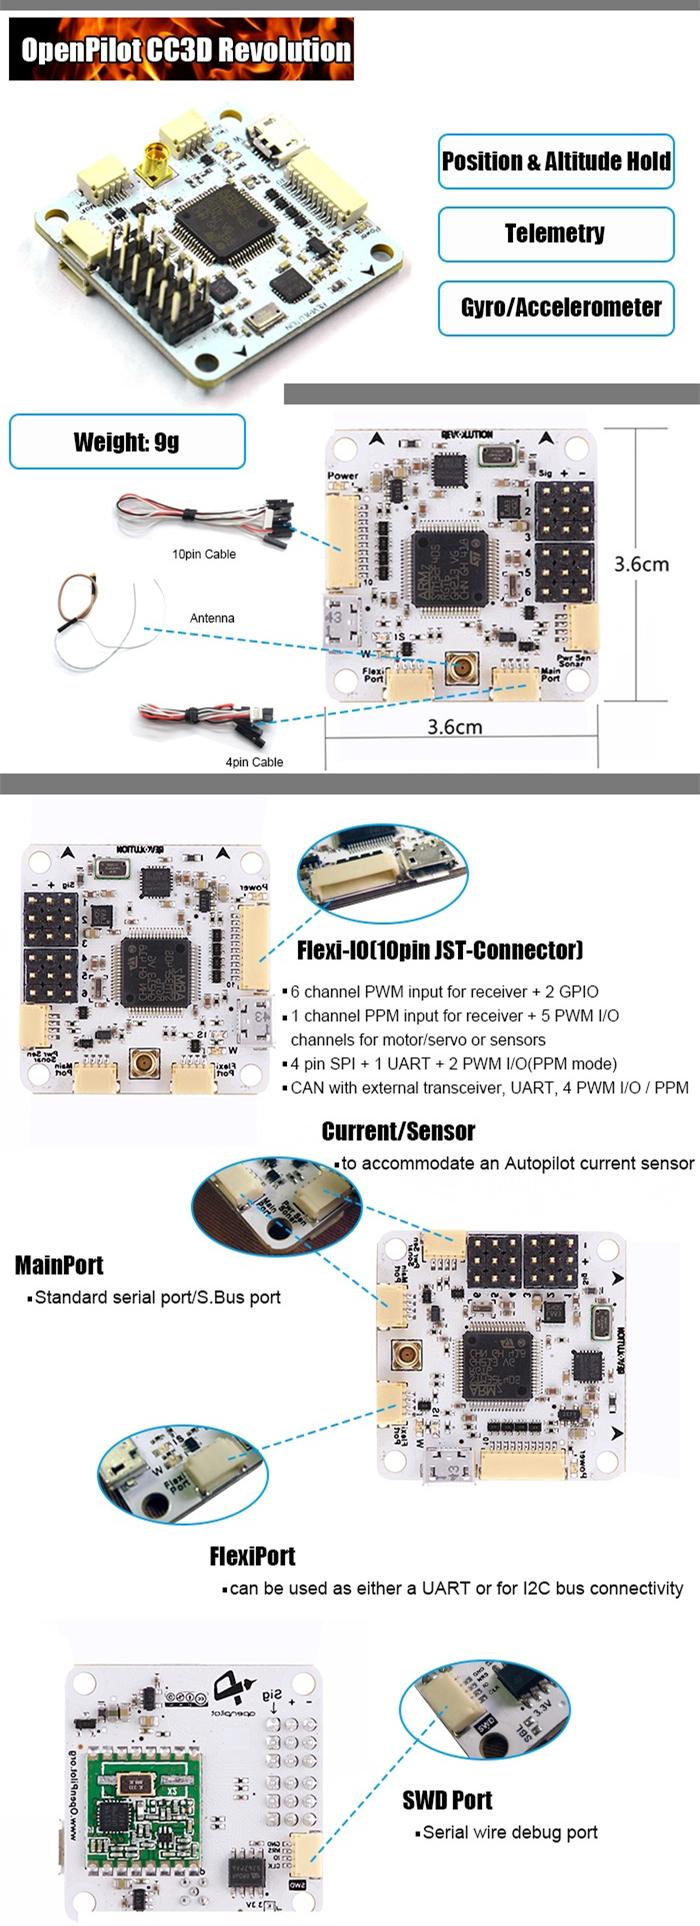 medium resolution of openpilot cc3d revolution flight controller oplink m8n gps distribution board for rc drone